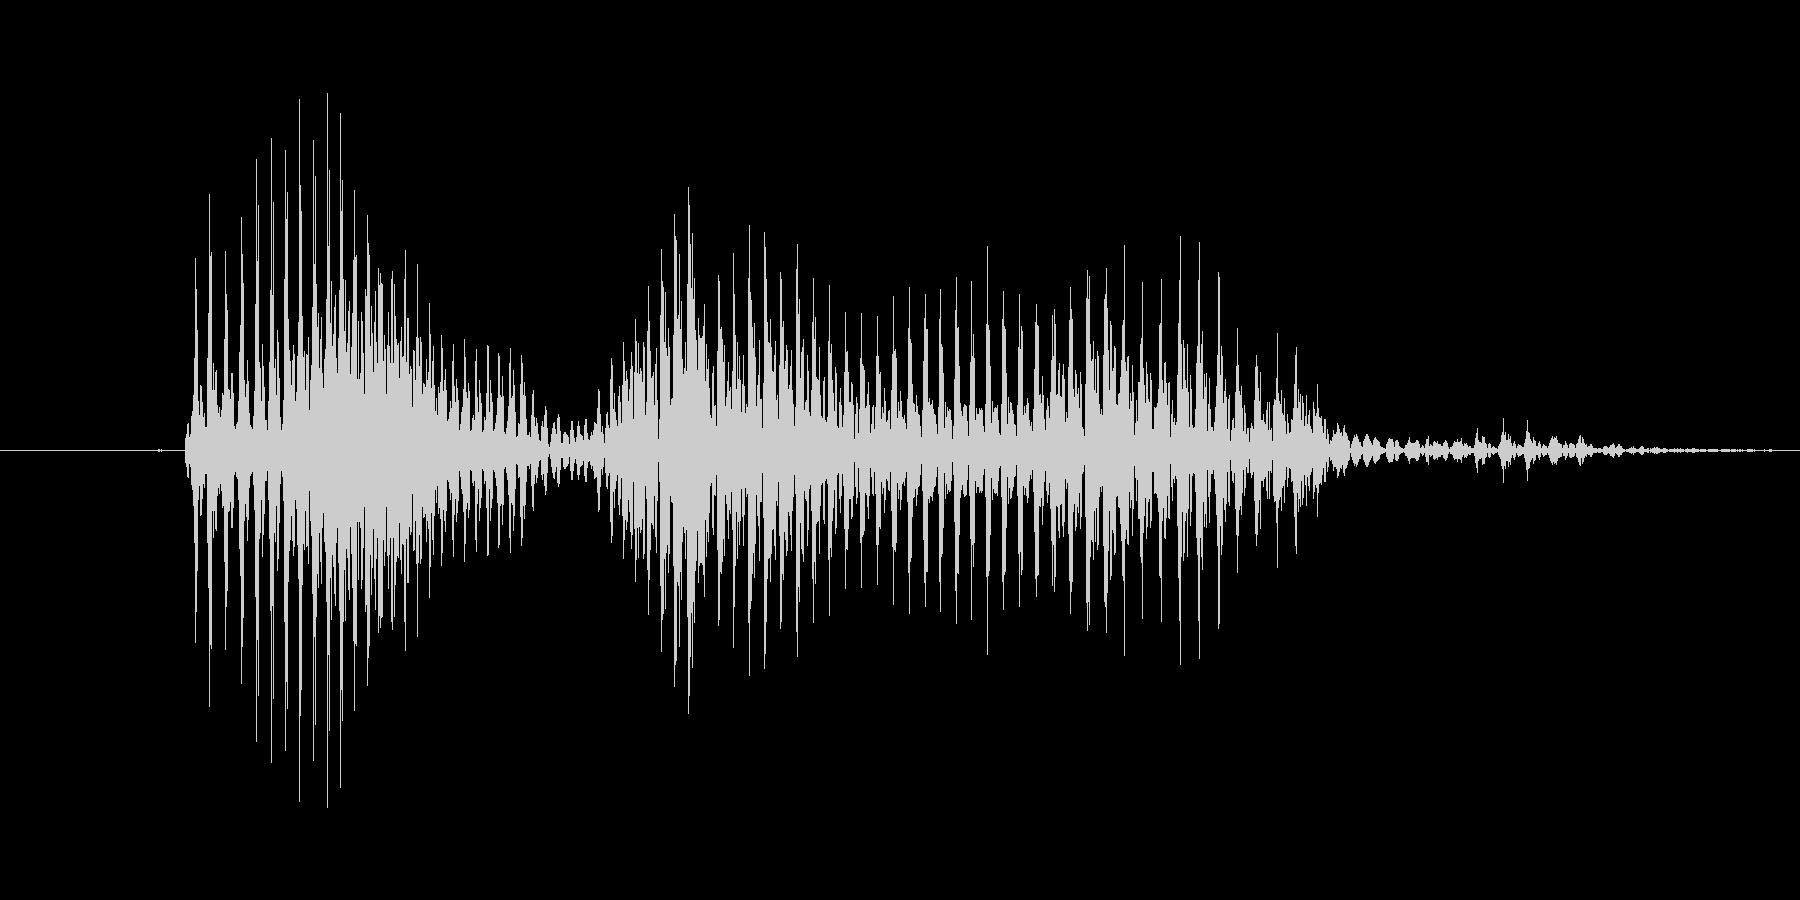 「8 AM」英語発音の未再生の波形